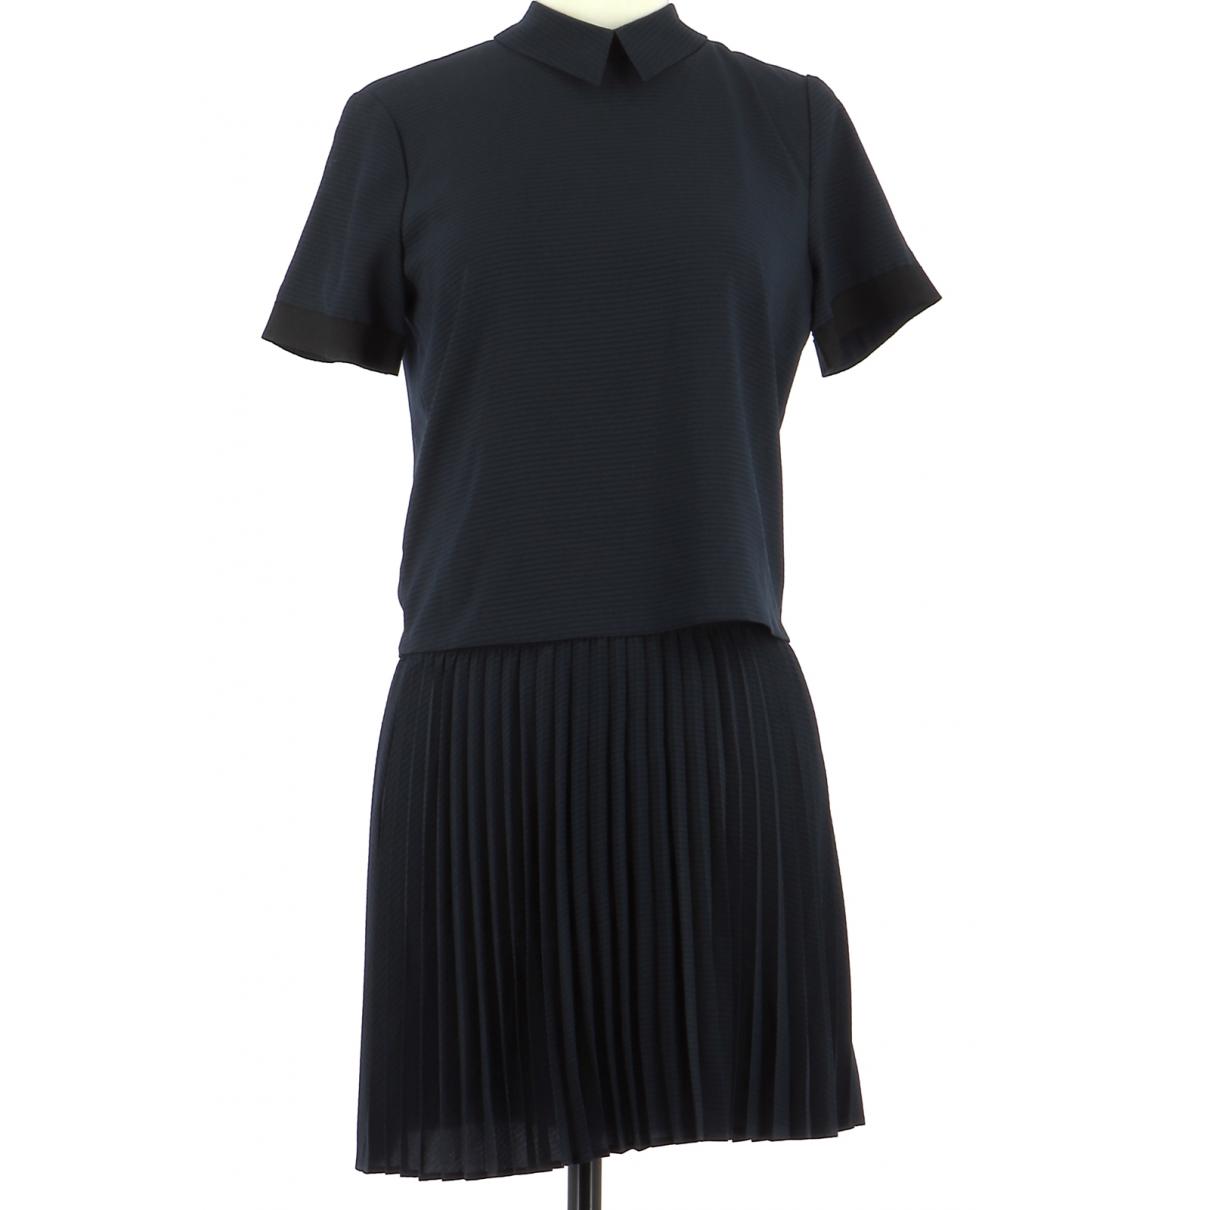 Autre Marque \N Navy dress for Women 34 FR